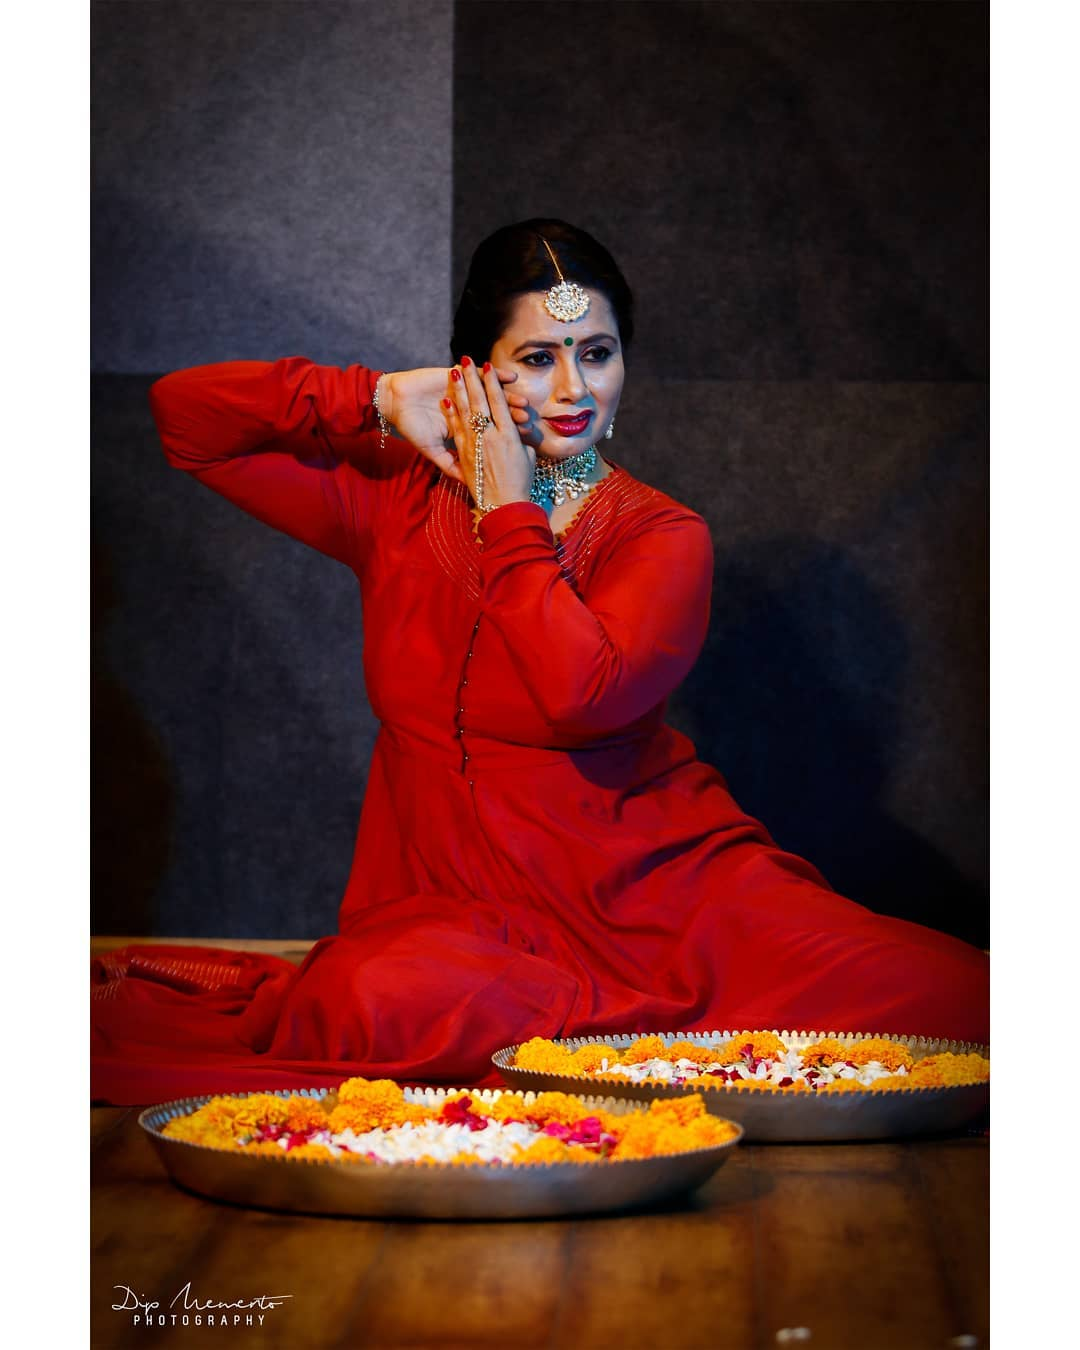 K A T H A K: Art of telling story.. . Dance Video Shoot for  @nrityalayabyjashodapatel @jashodapatel_kathak . . Photo/Videography:  @dip_memento_photography . .  #kathakdancers #indiandancecrew #bollywooddance #dancersofindia  #kathak #kathakdance #classicaldance #ahmedabad #indianclassicaldance #pirouettes #chakkars #happydancing #classicaldance #indiandancer #dancersofinstagram #indianclassicaldance  #kathakdance #kathakdancer #indianclassicaldancers #9924227745 #spins  #worldofdance #dance #indiandanceform #loveforkathak #dancers #dancersindia